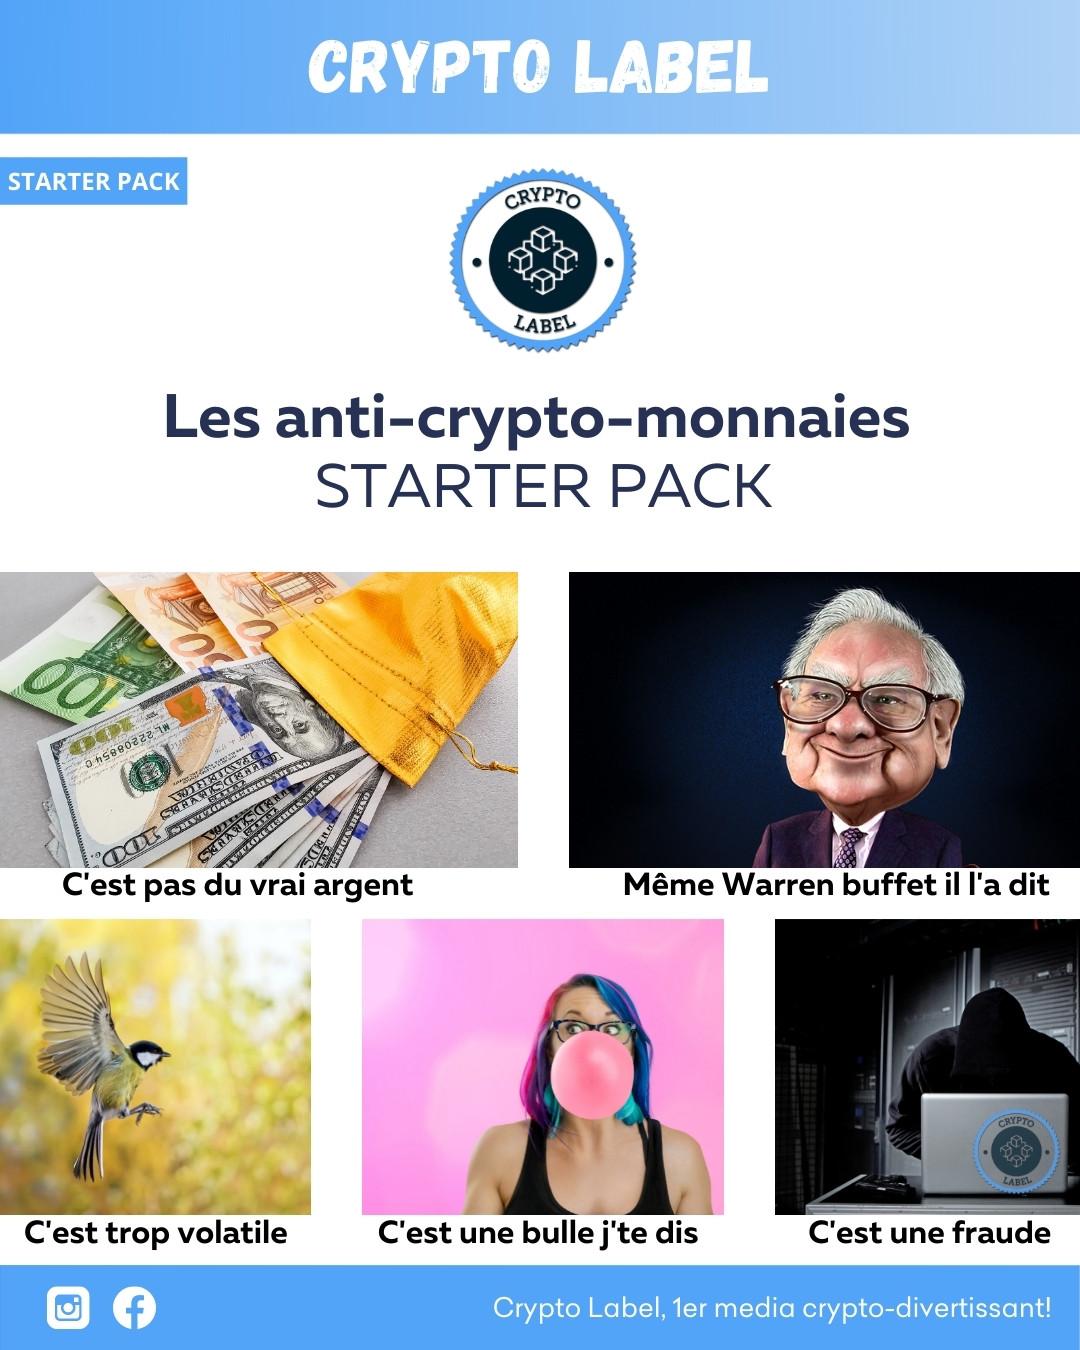 Les anti-crypto-monnaies- STARTER PACK Crypto Label